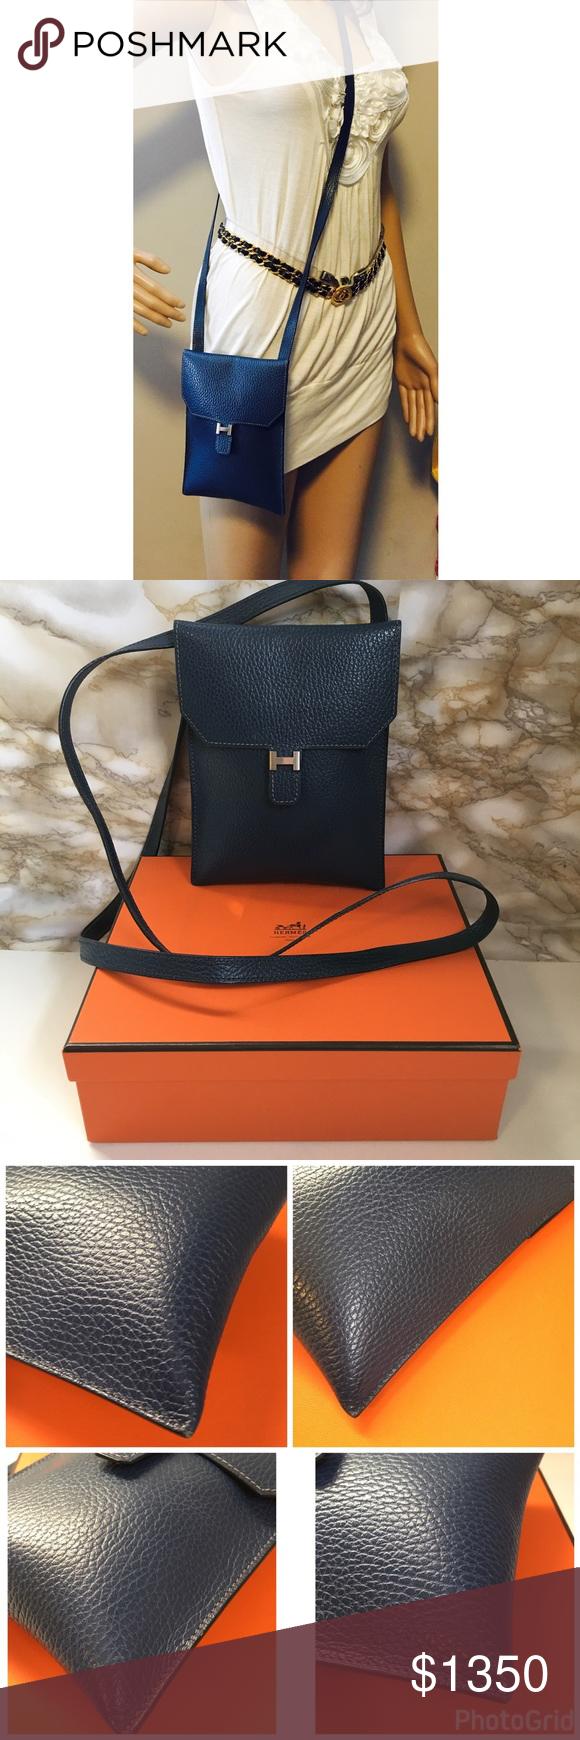 Hermes Bleu Rio shoulder  cross body bag Size W  5.31